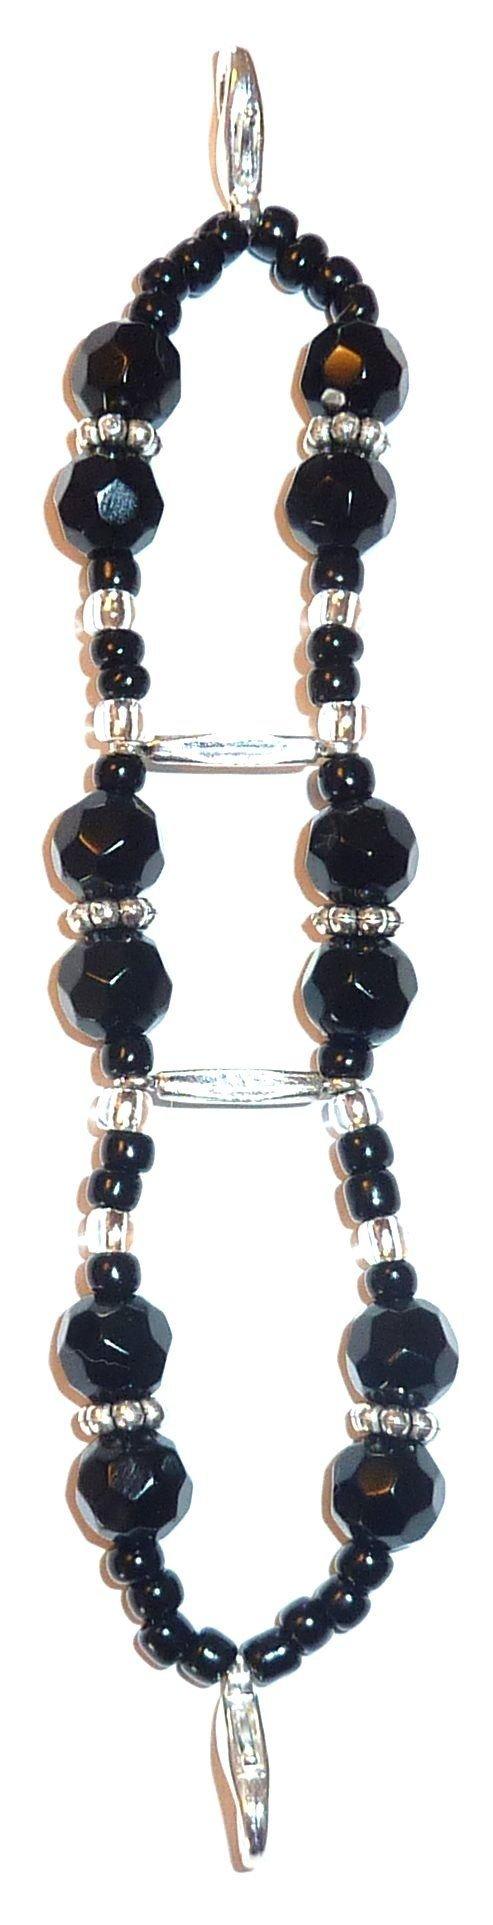 Double Band Stretch Black women's Medical Alert ID Interchangeable Replacement Bracelet (Black)